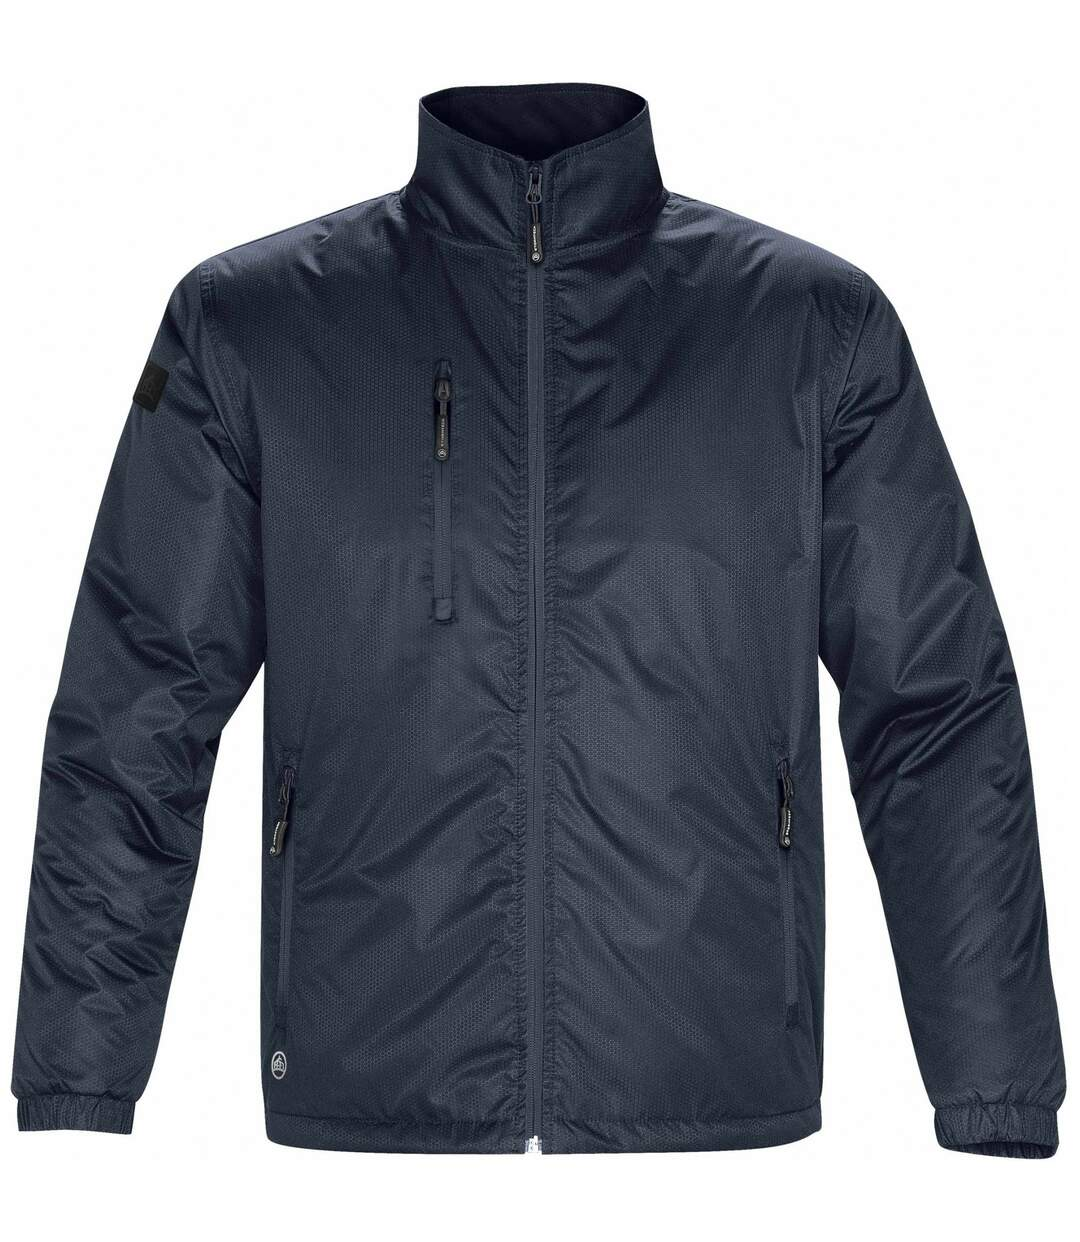 Stormtech Mens Axis Water Resistant Jacket (Navy/Navy) - UTBC2079